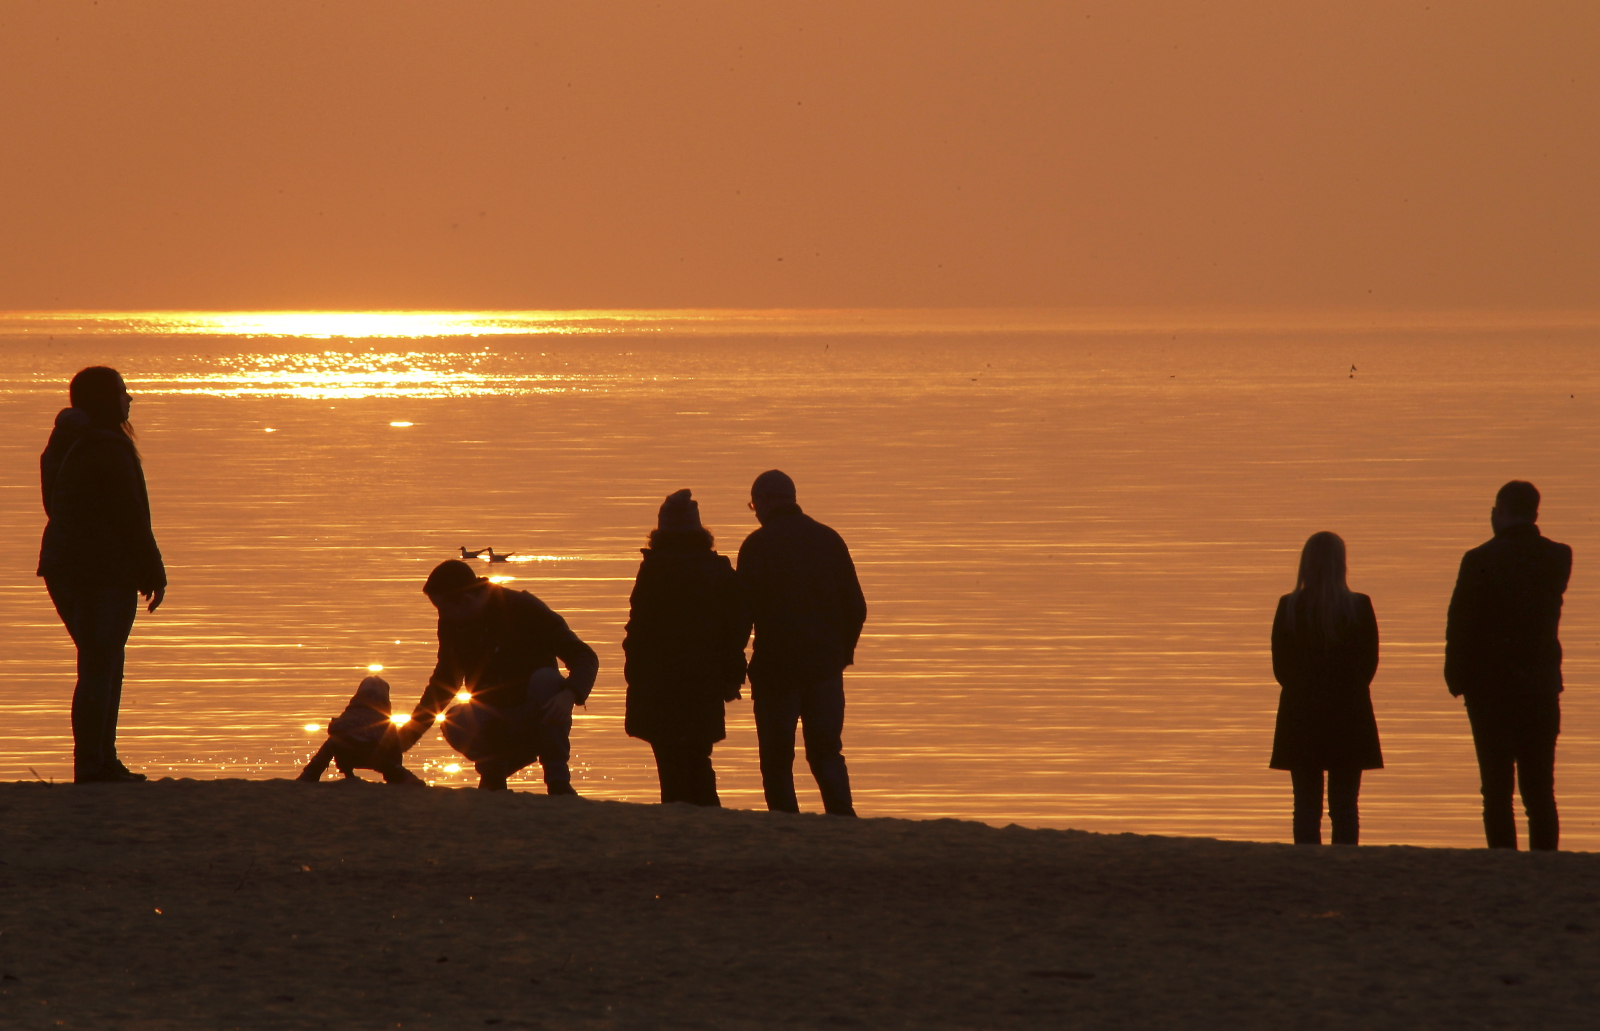 Litwa, zachód słońca  EPA/Toms Kalnins